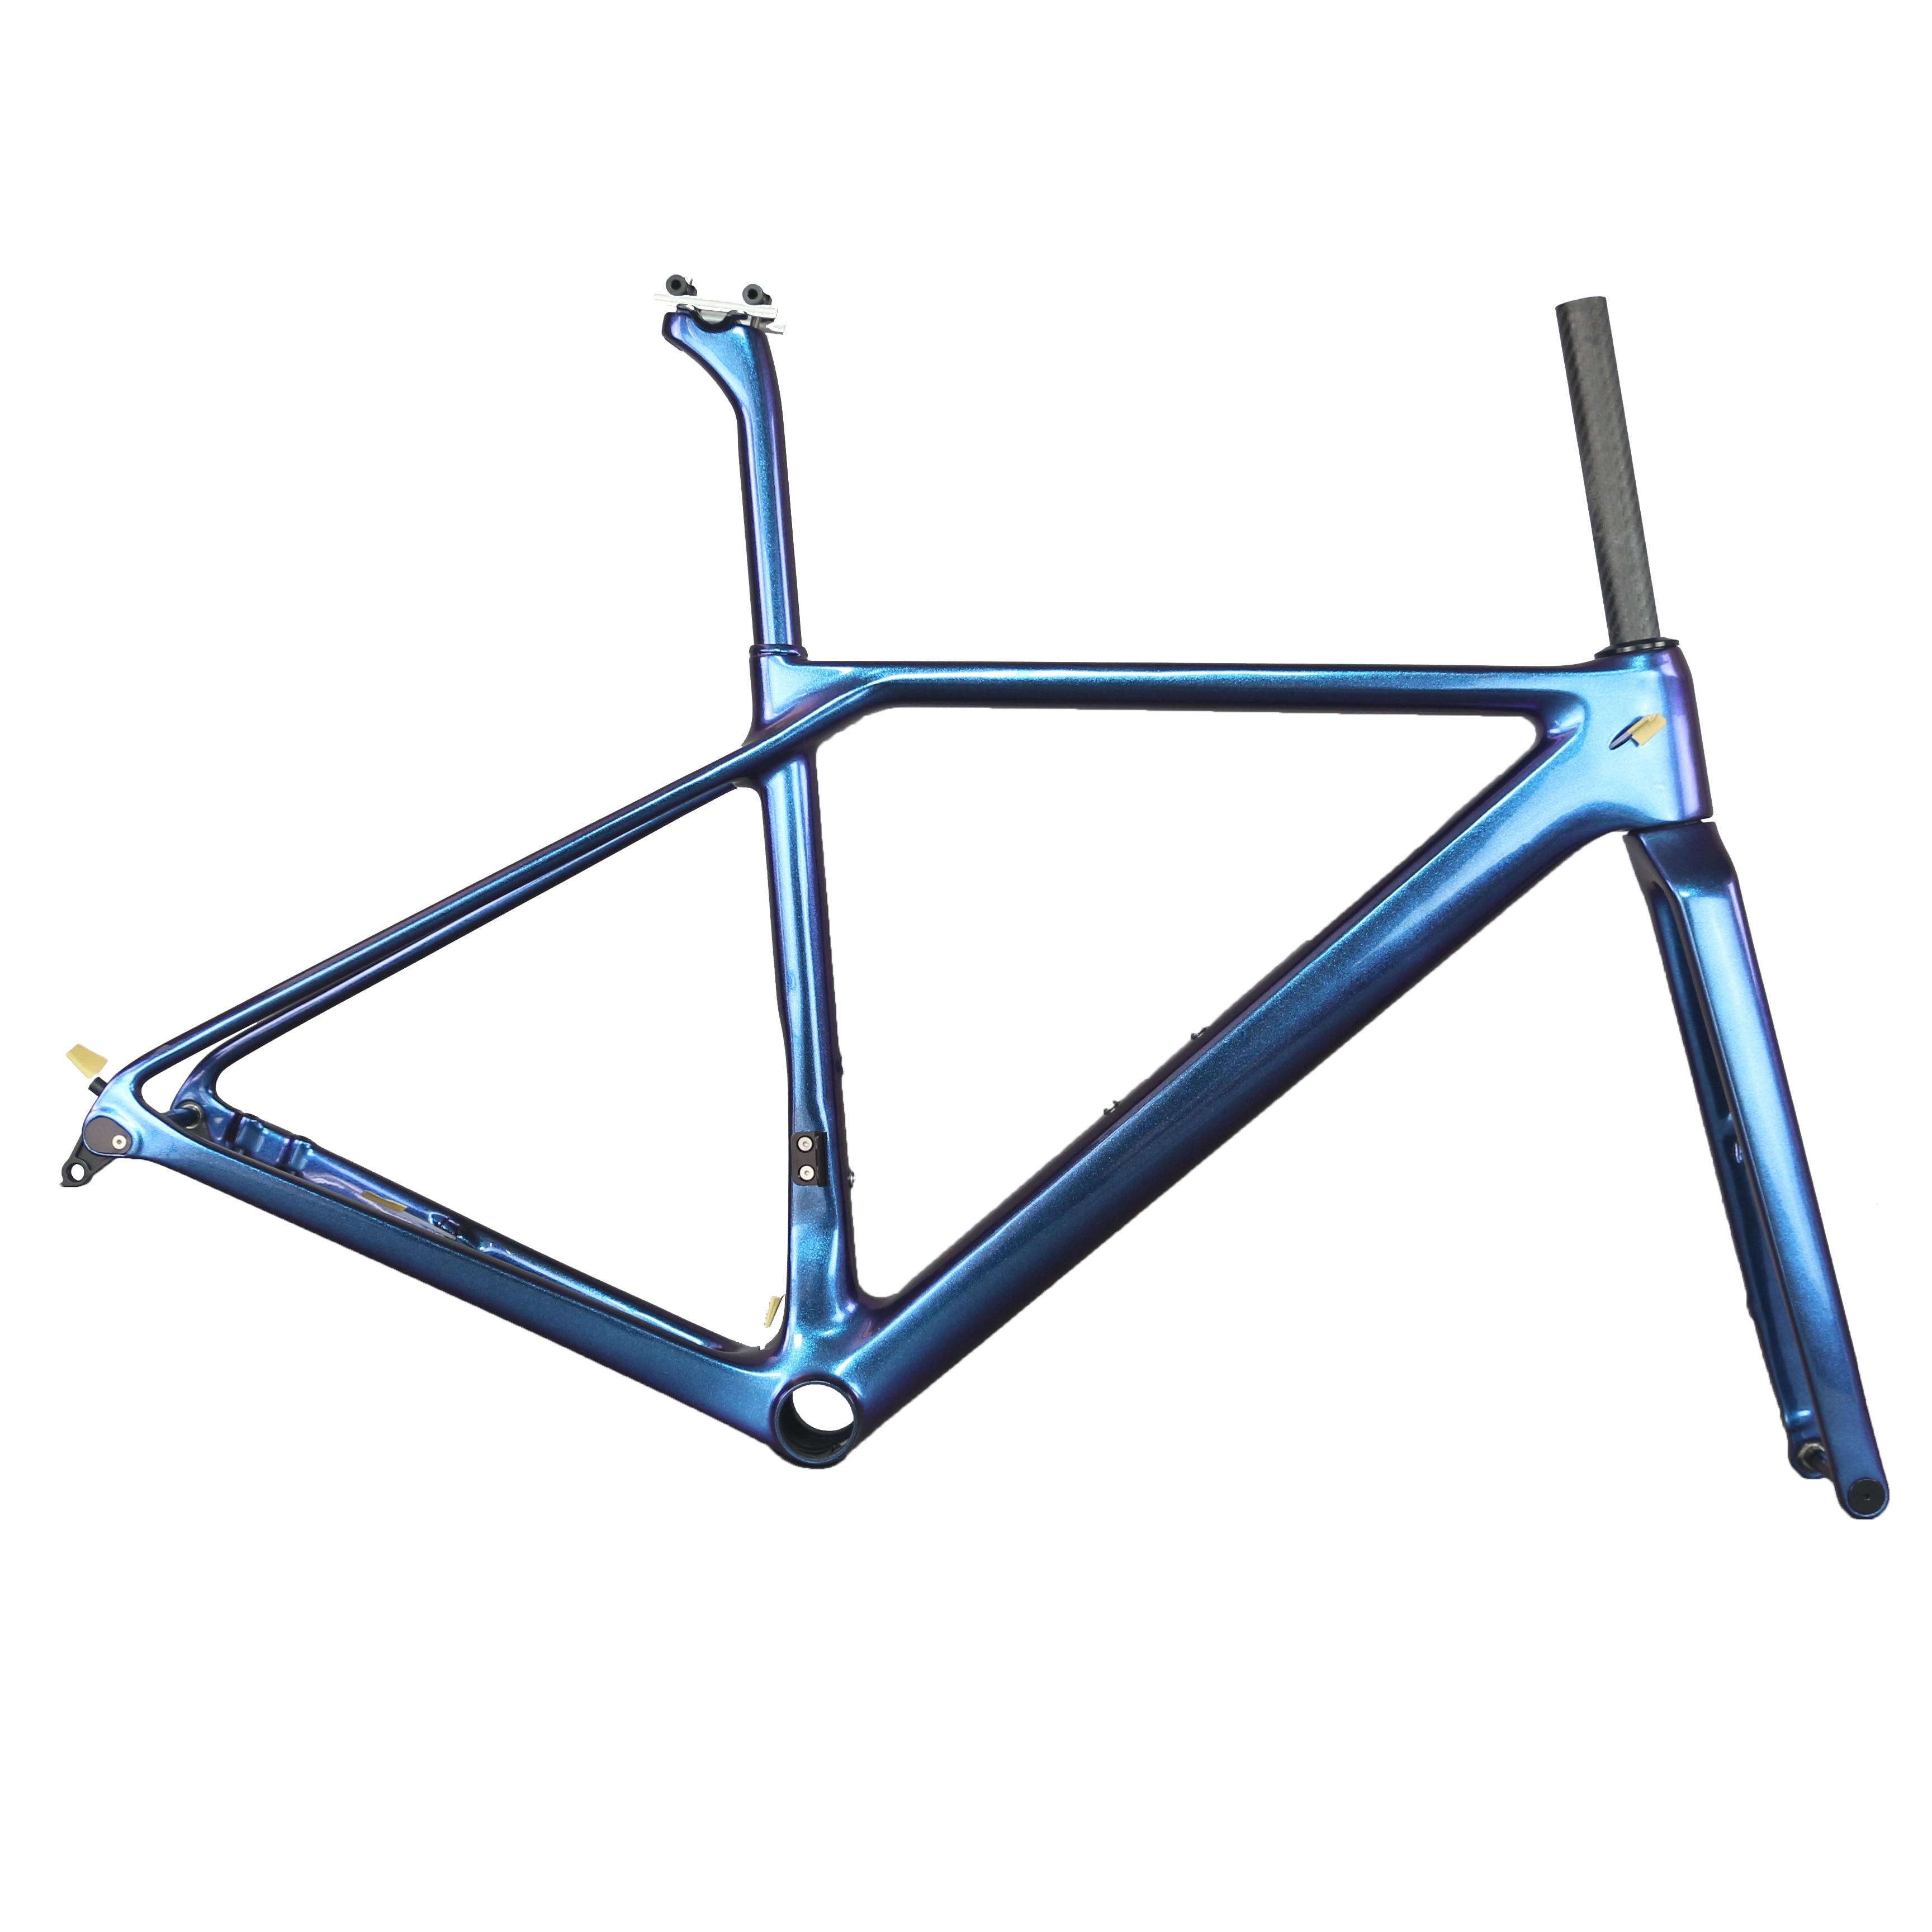 2019  Chameleon Paint Toray  T1000 Carbon Fiber  Flat Mount Disc Brake All Internal Cable  Road Bike Frame FM009